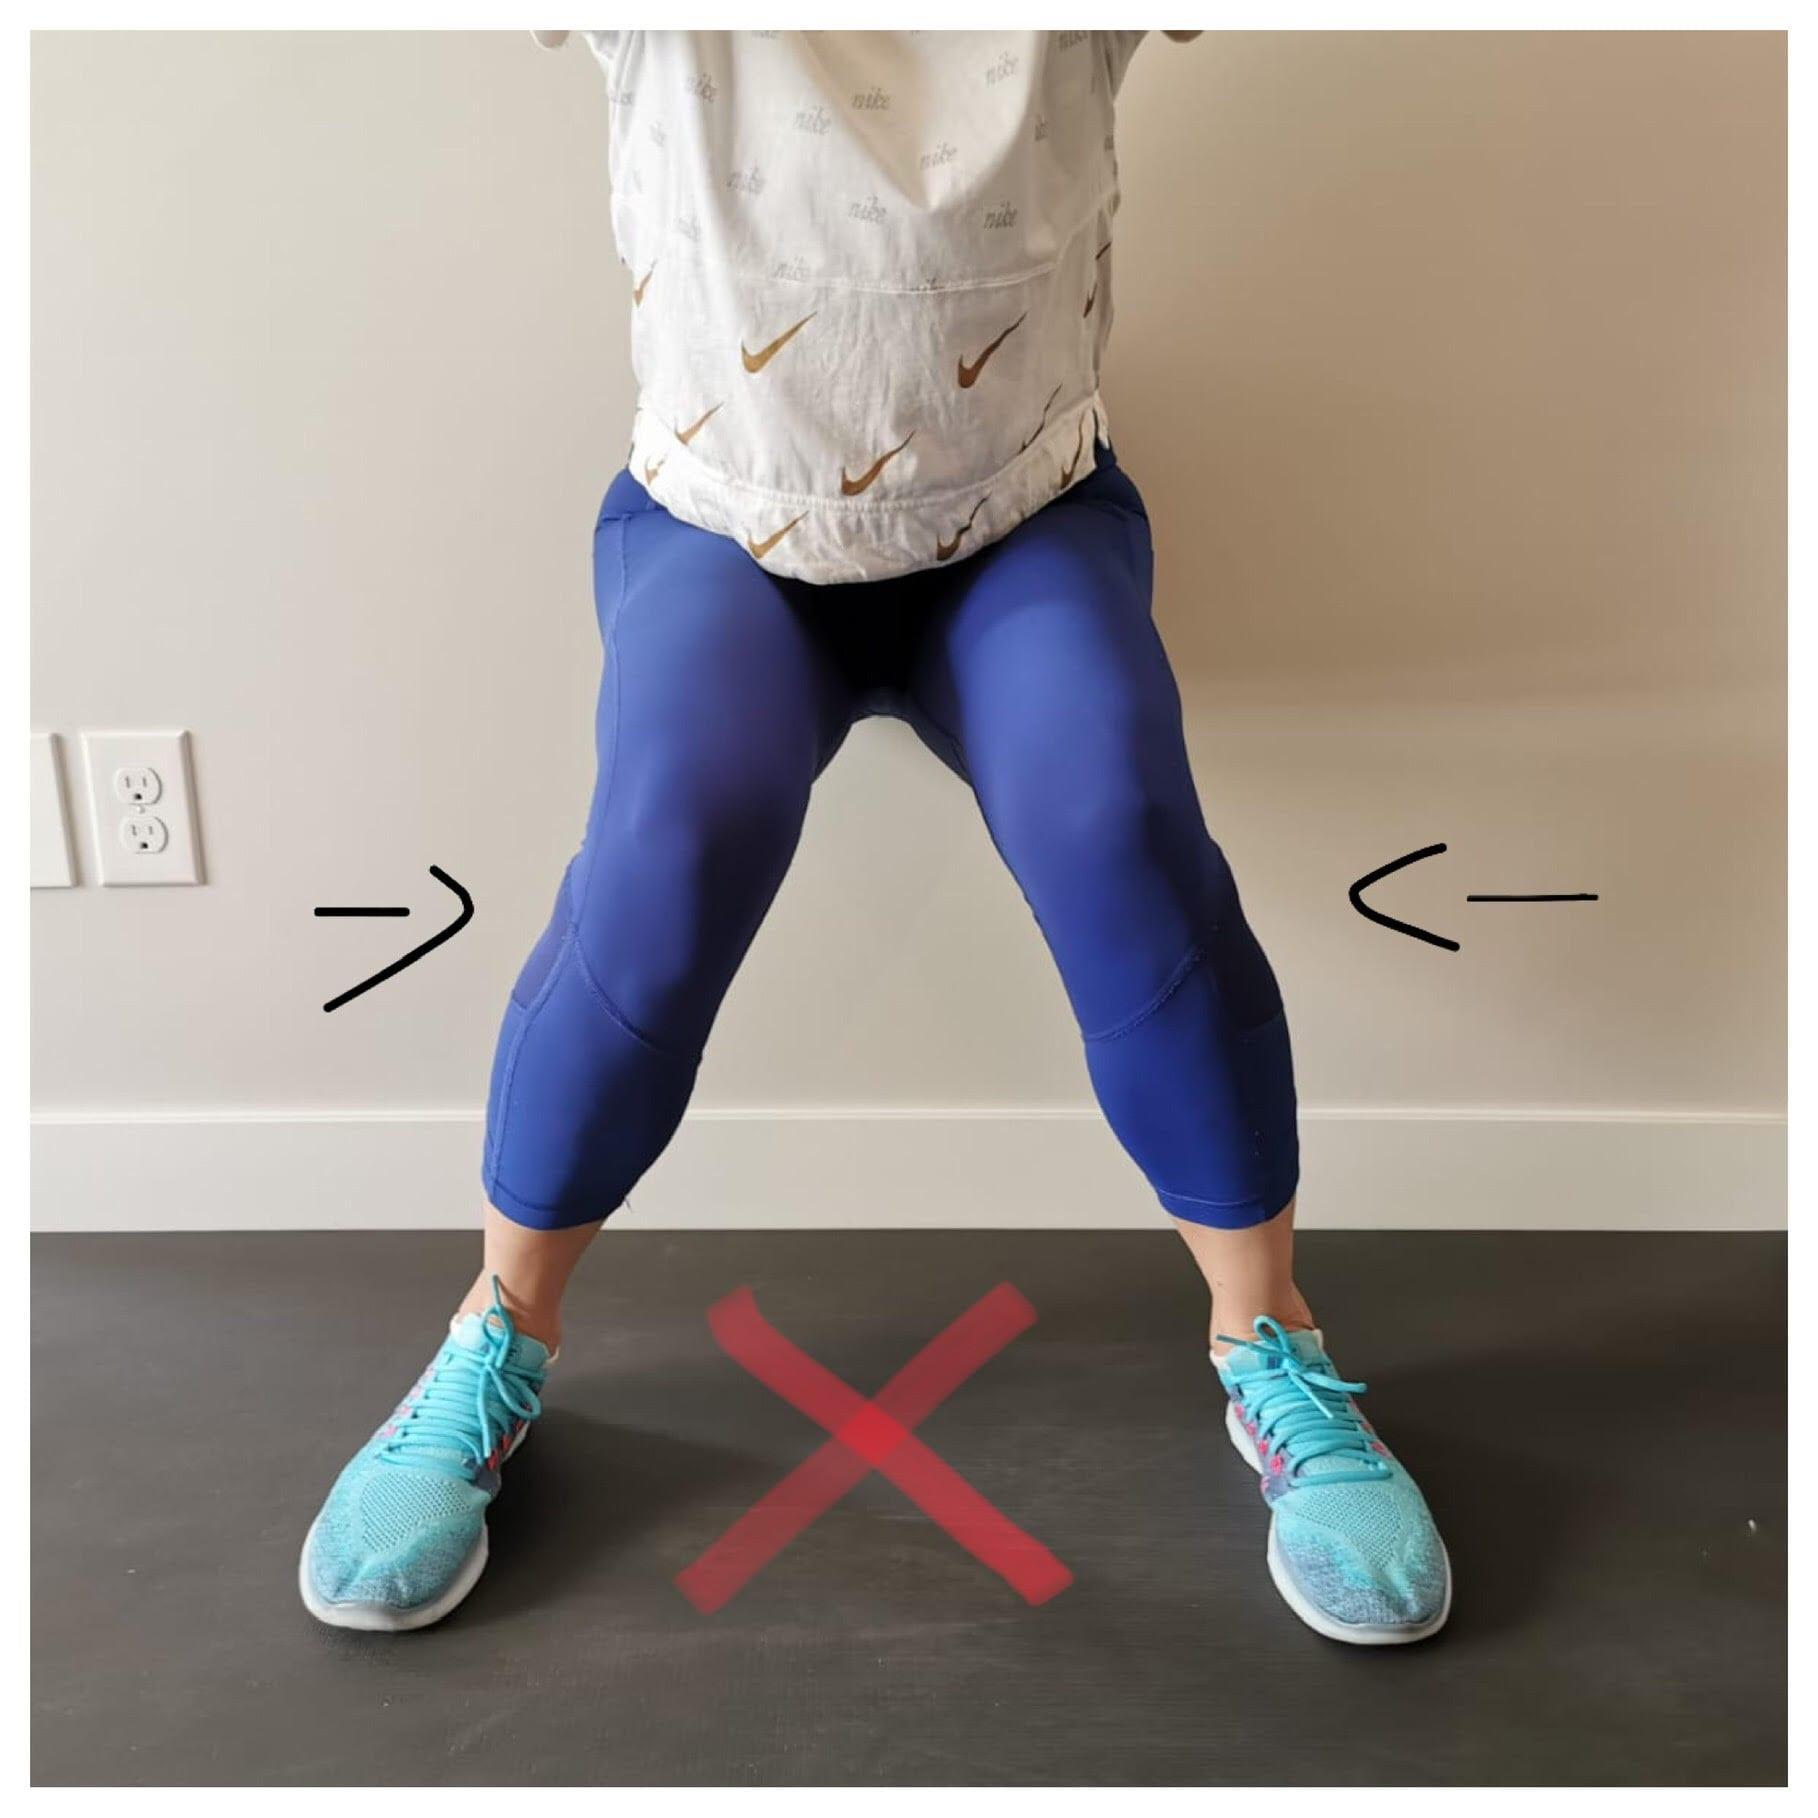 Knee Valgus When Squatting